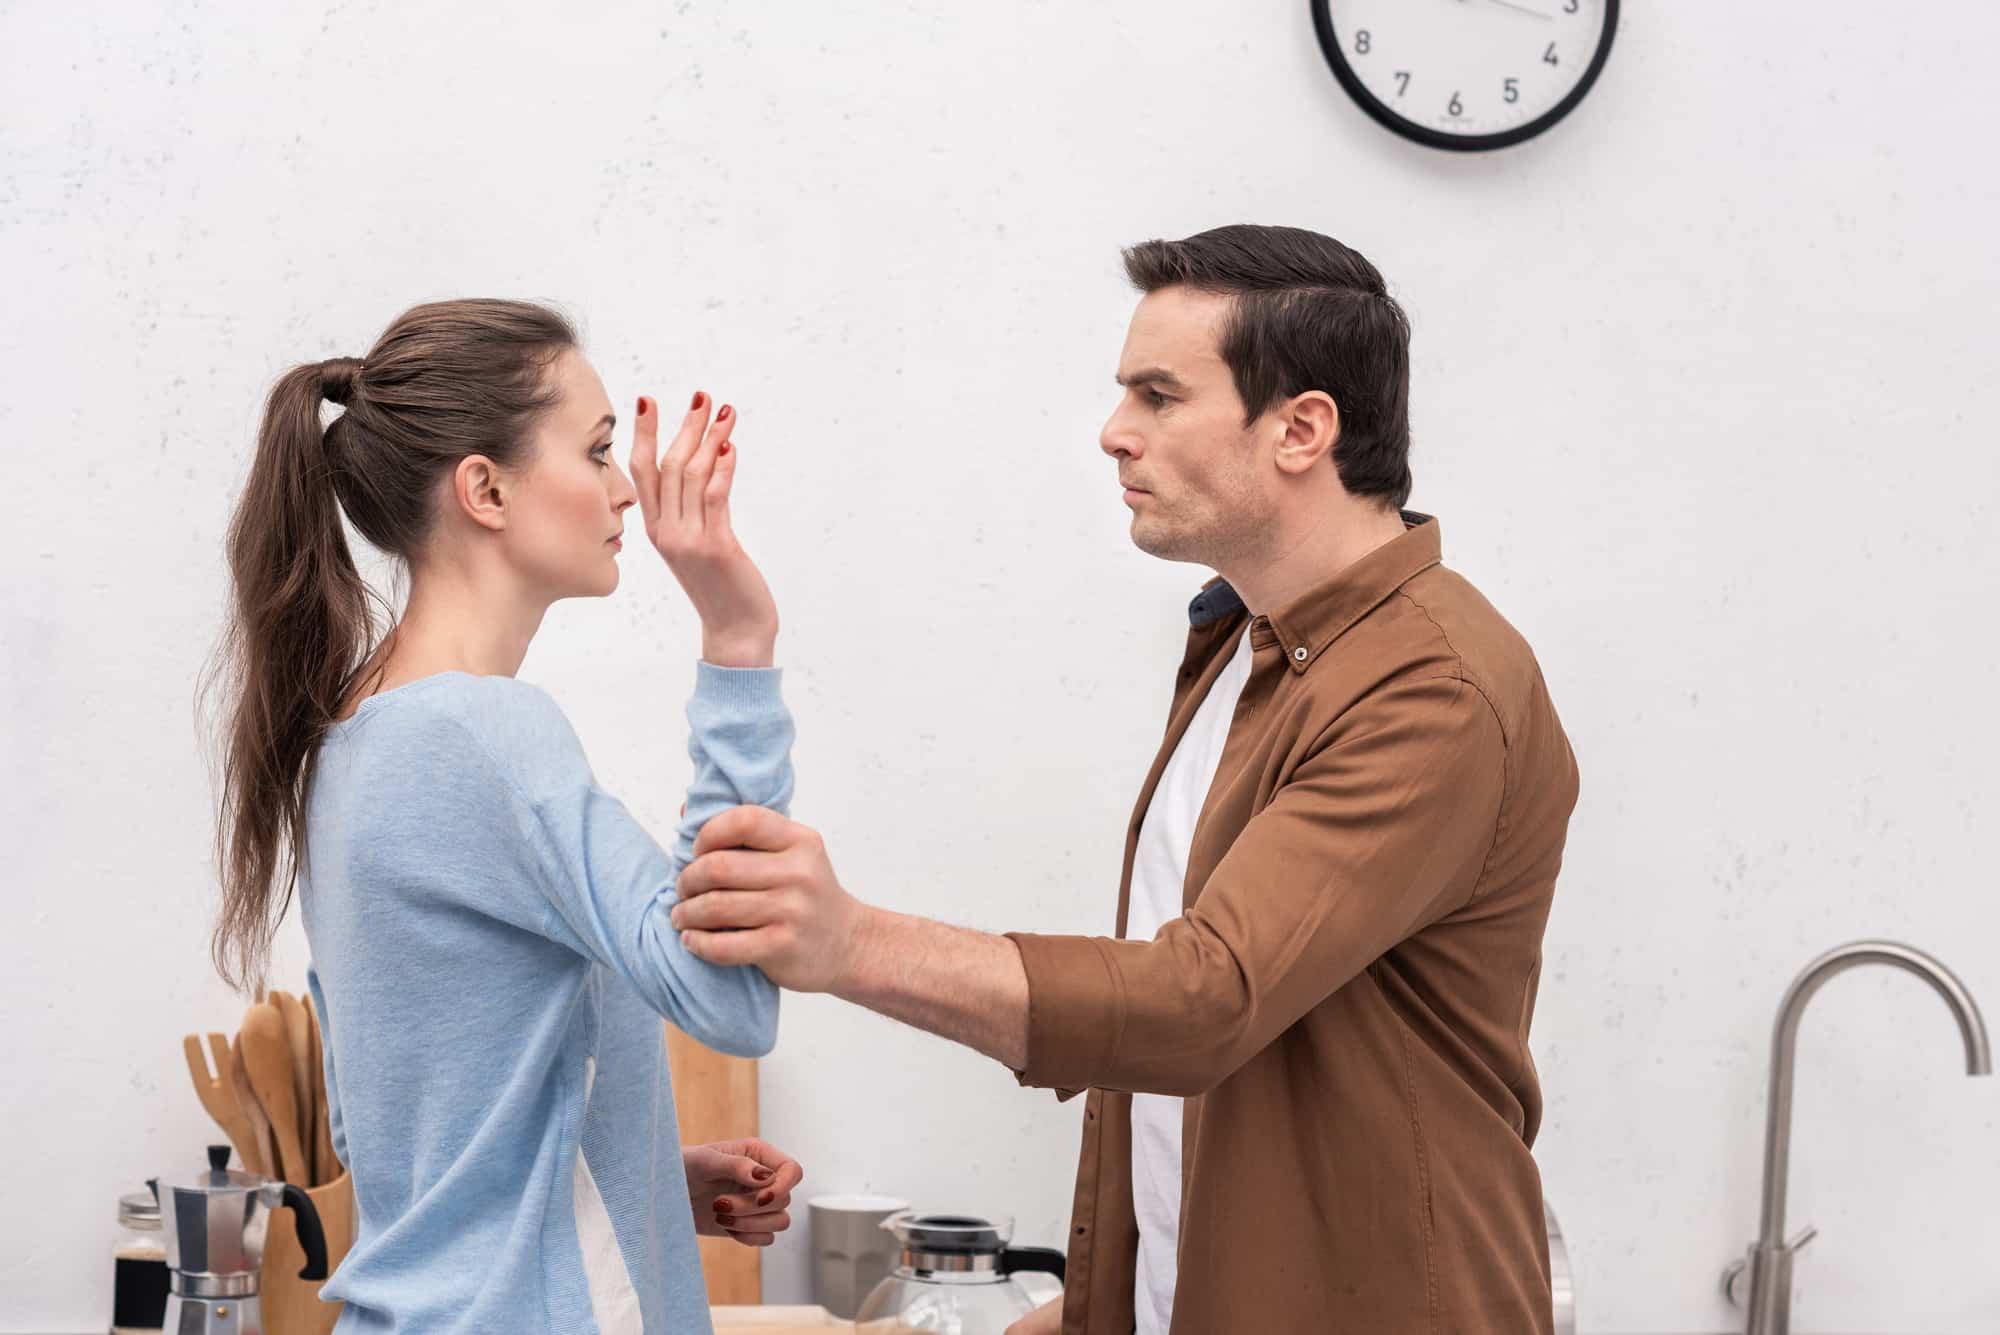 private investigator tactics to catch a cheater